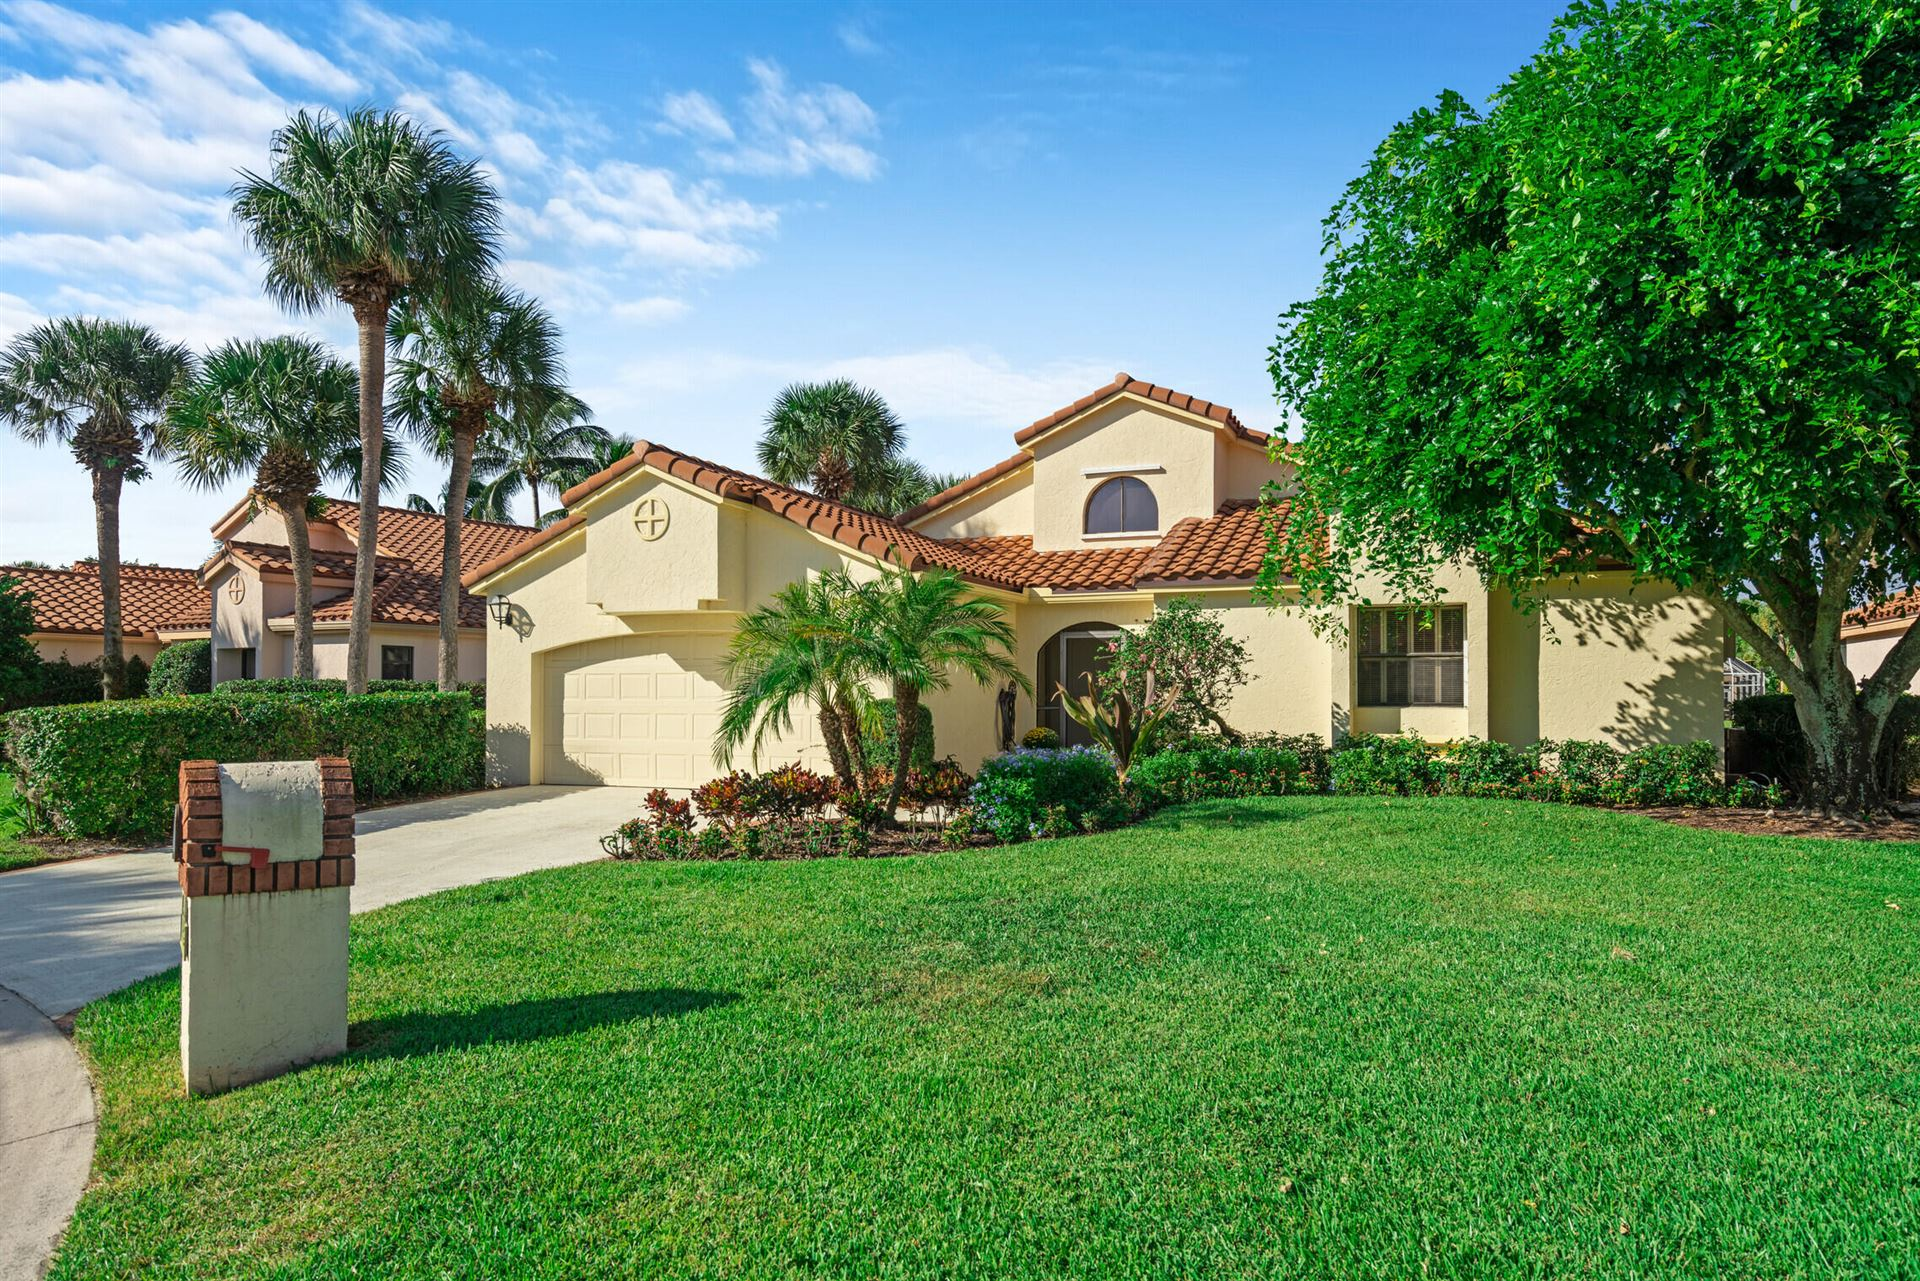 16663 Hidden Cove Drive, Jupiter, FL 33477 - MLS#: RX-10750665